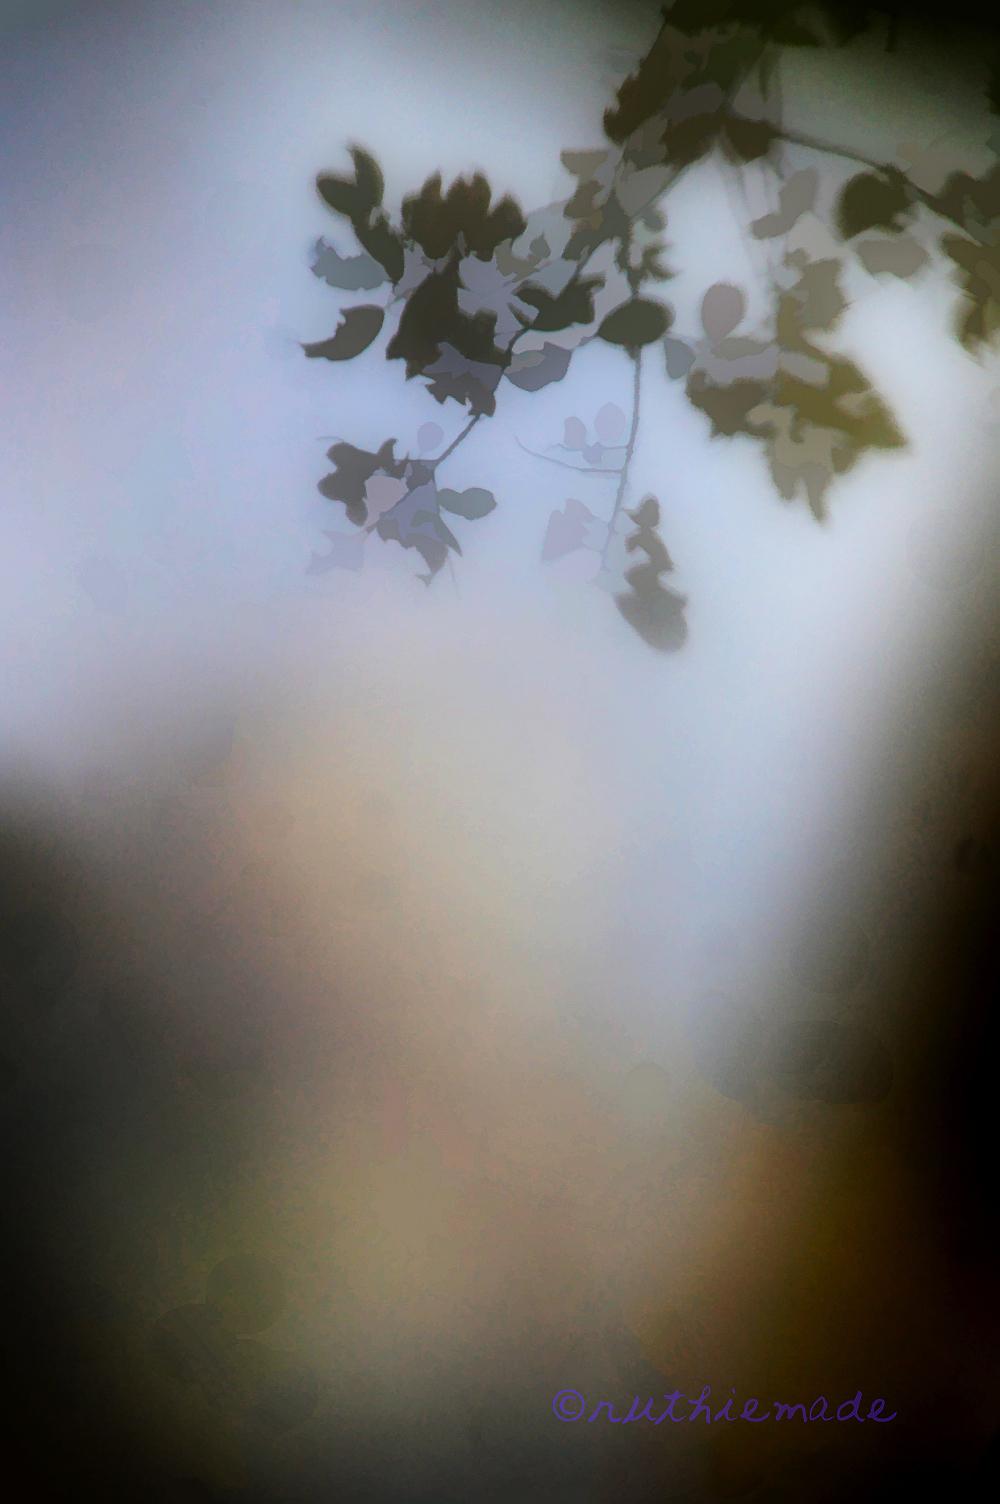 Misty Leaves